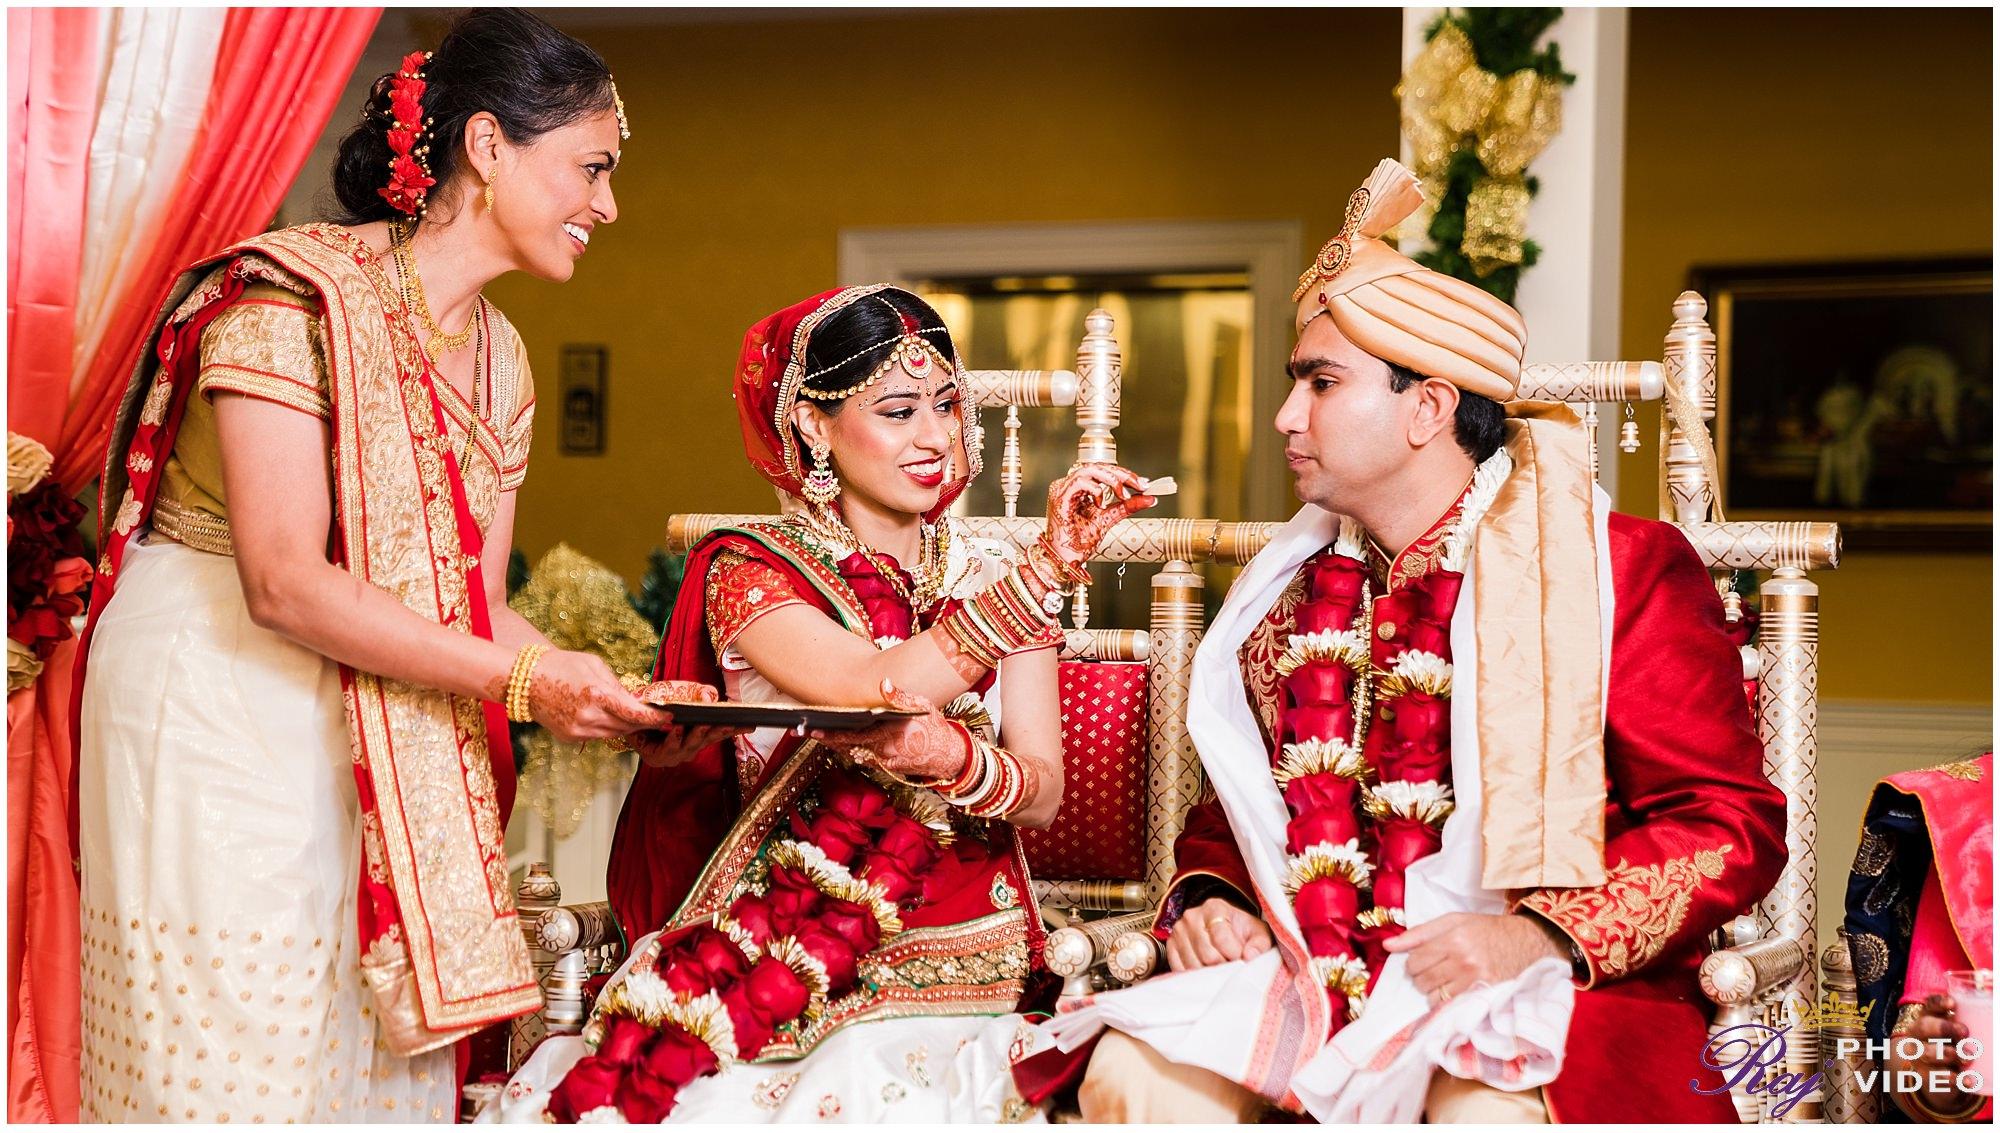 Founders-Inn-and-Spa-Virginia-Beach-VA-Indian-Wedding-Harini-Vivek-48.jpg